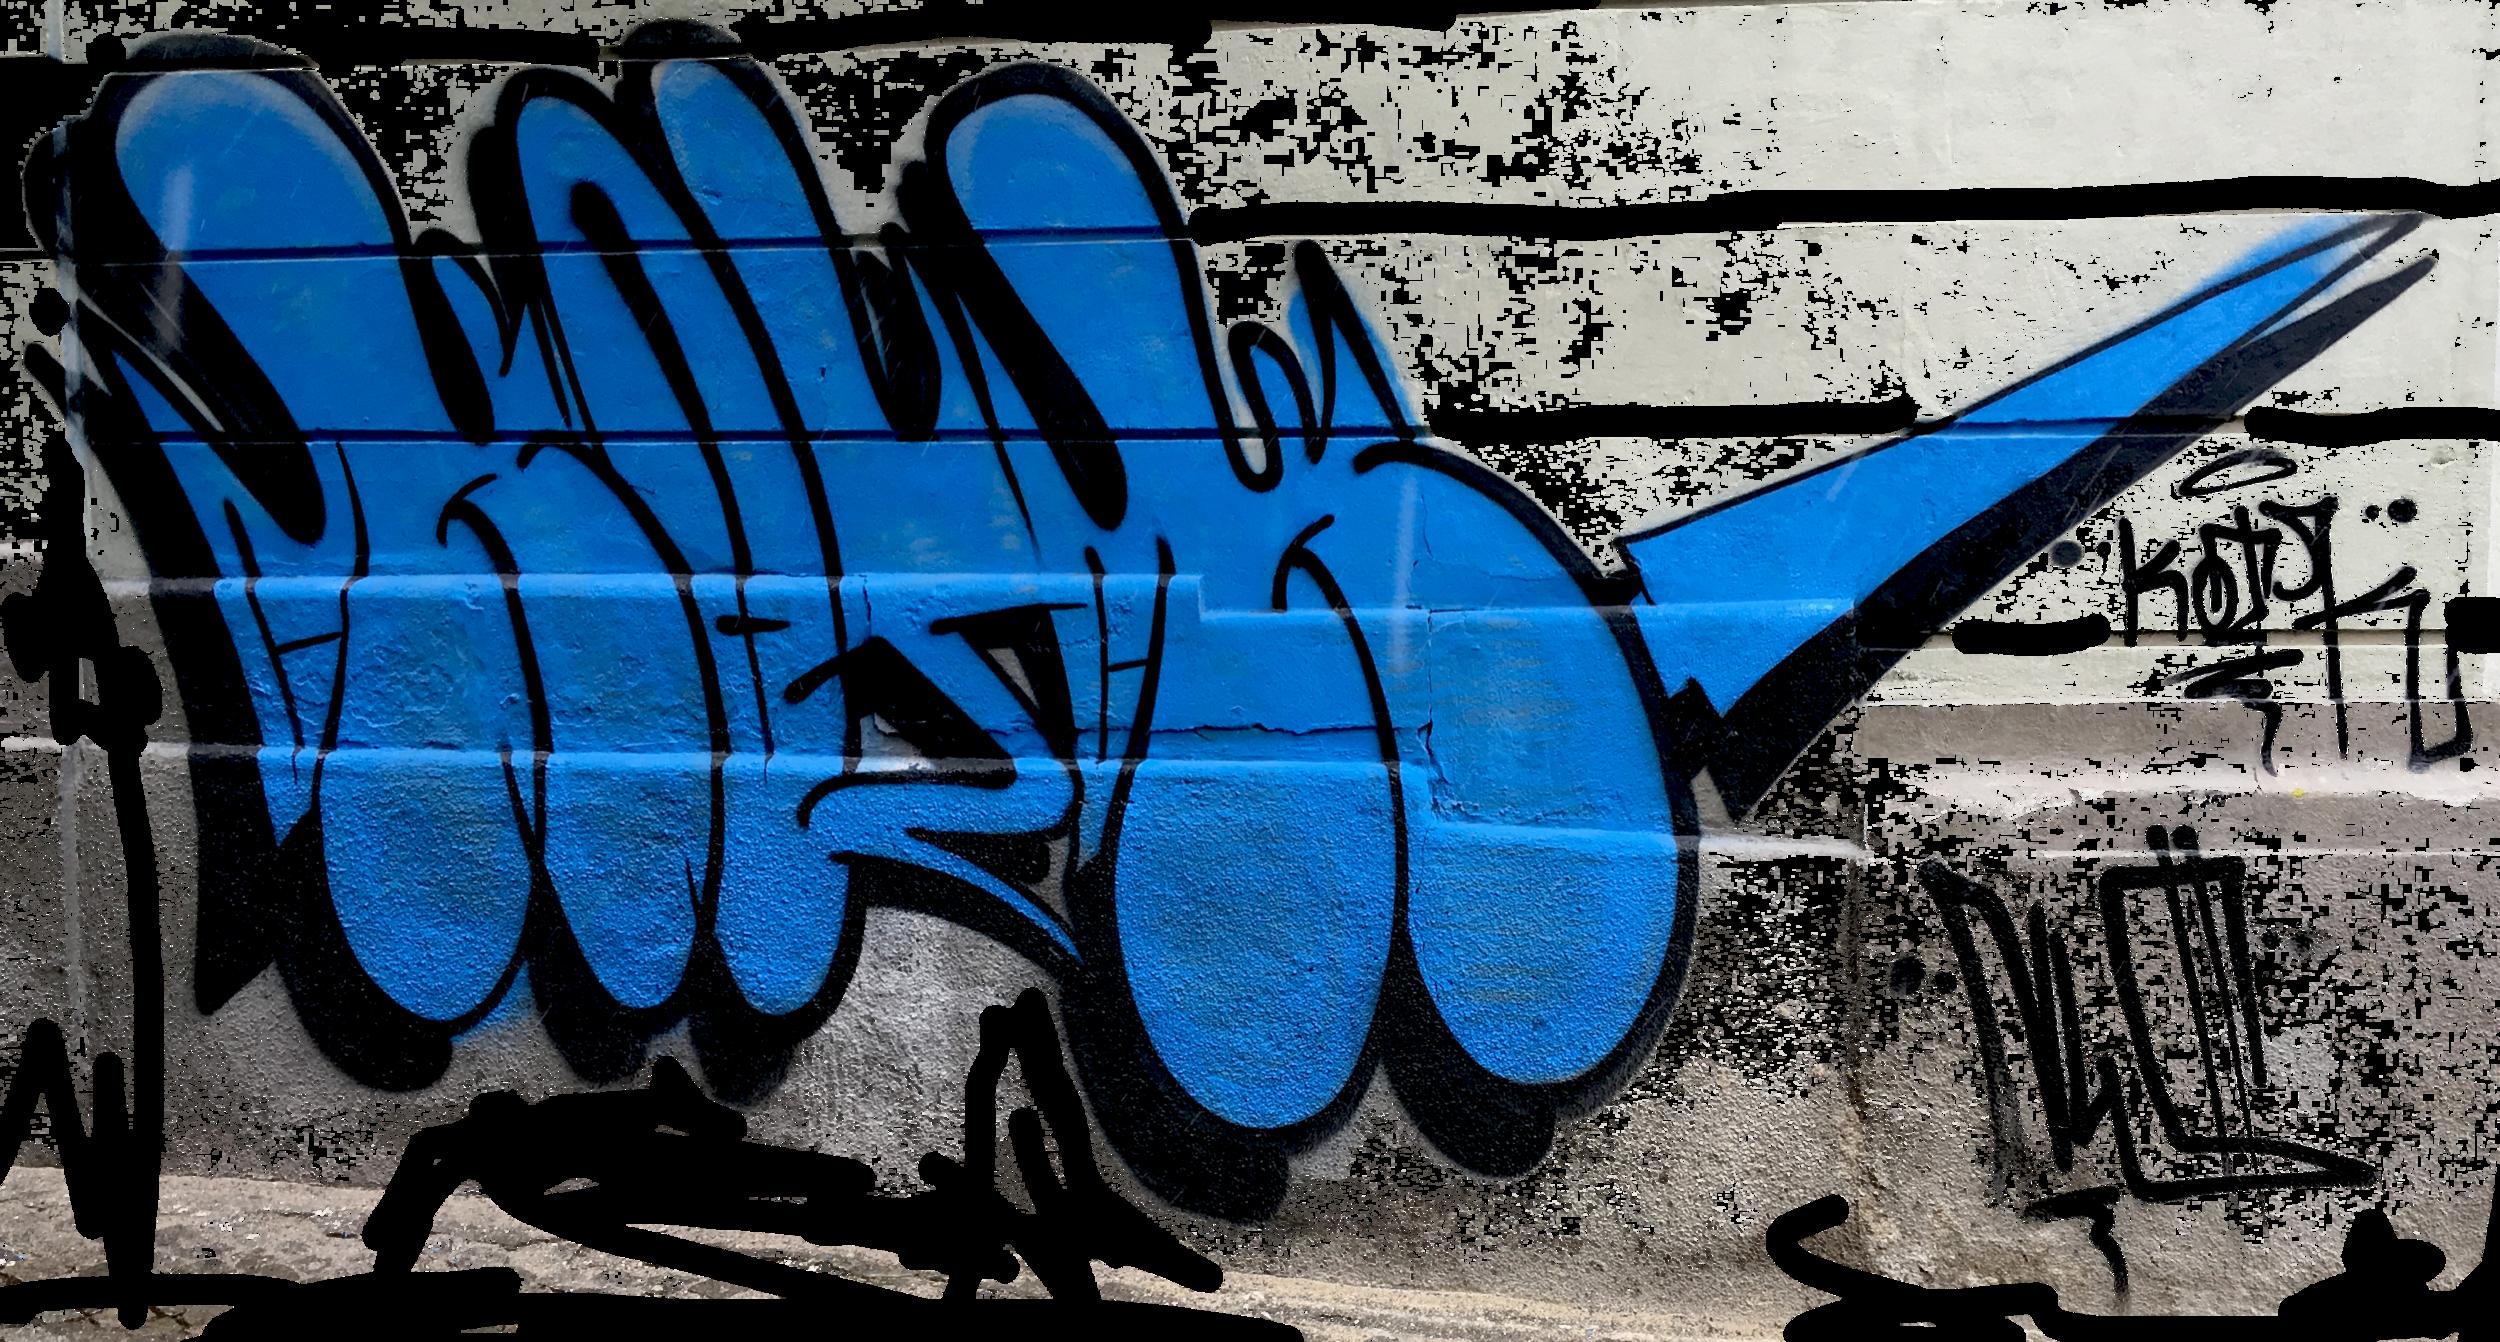 sofia graffiti 8.png